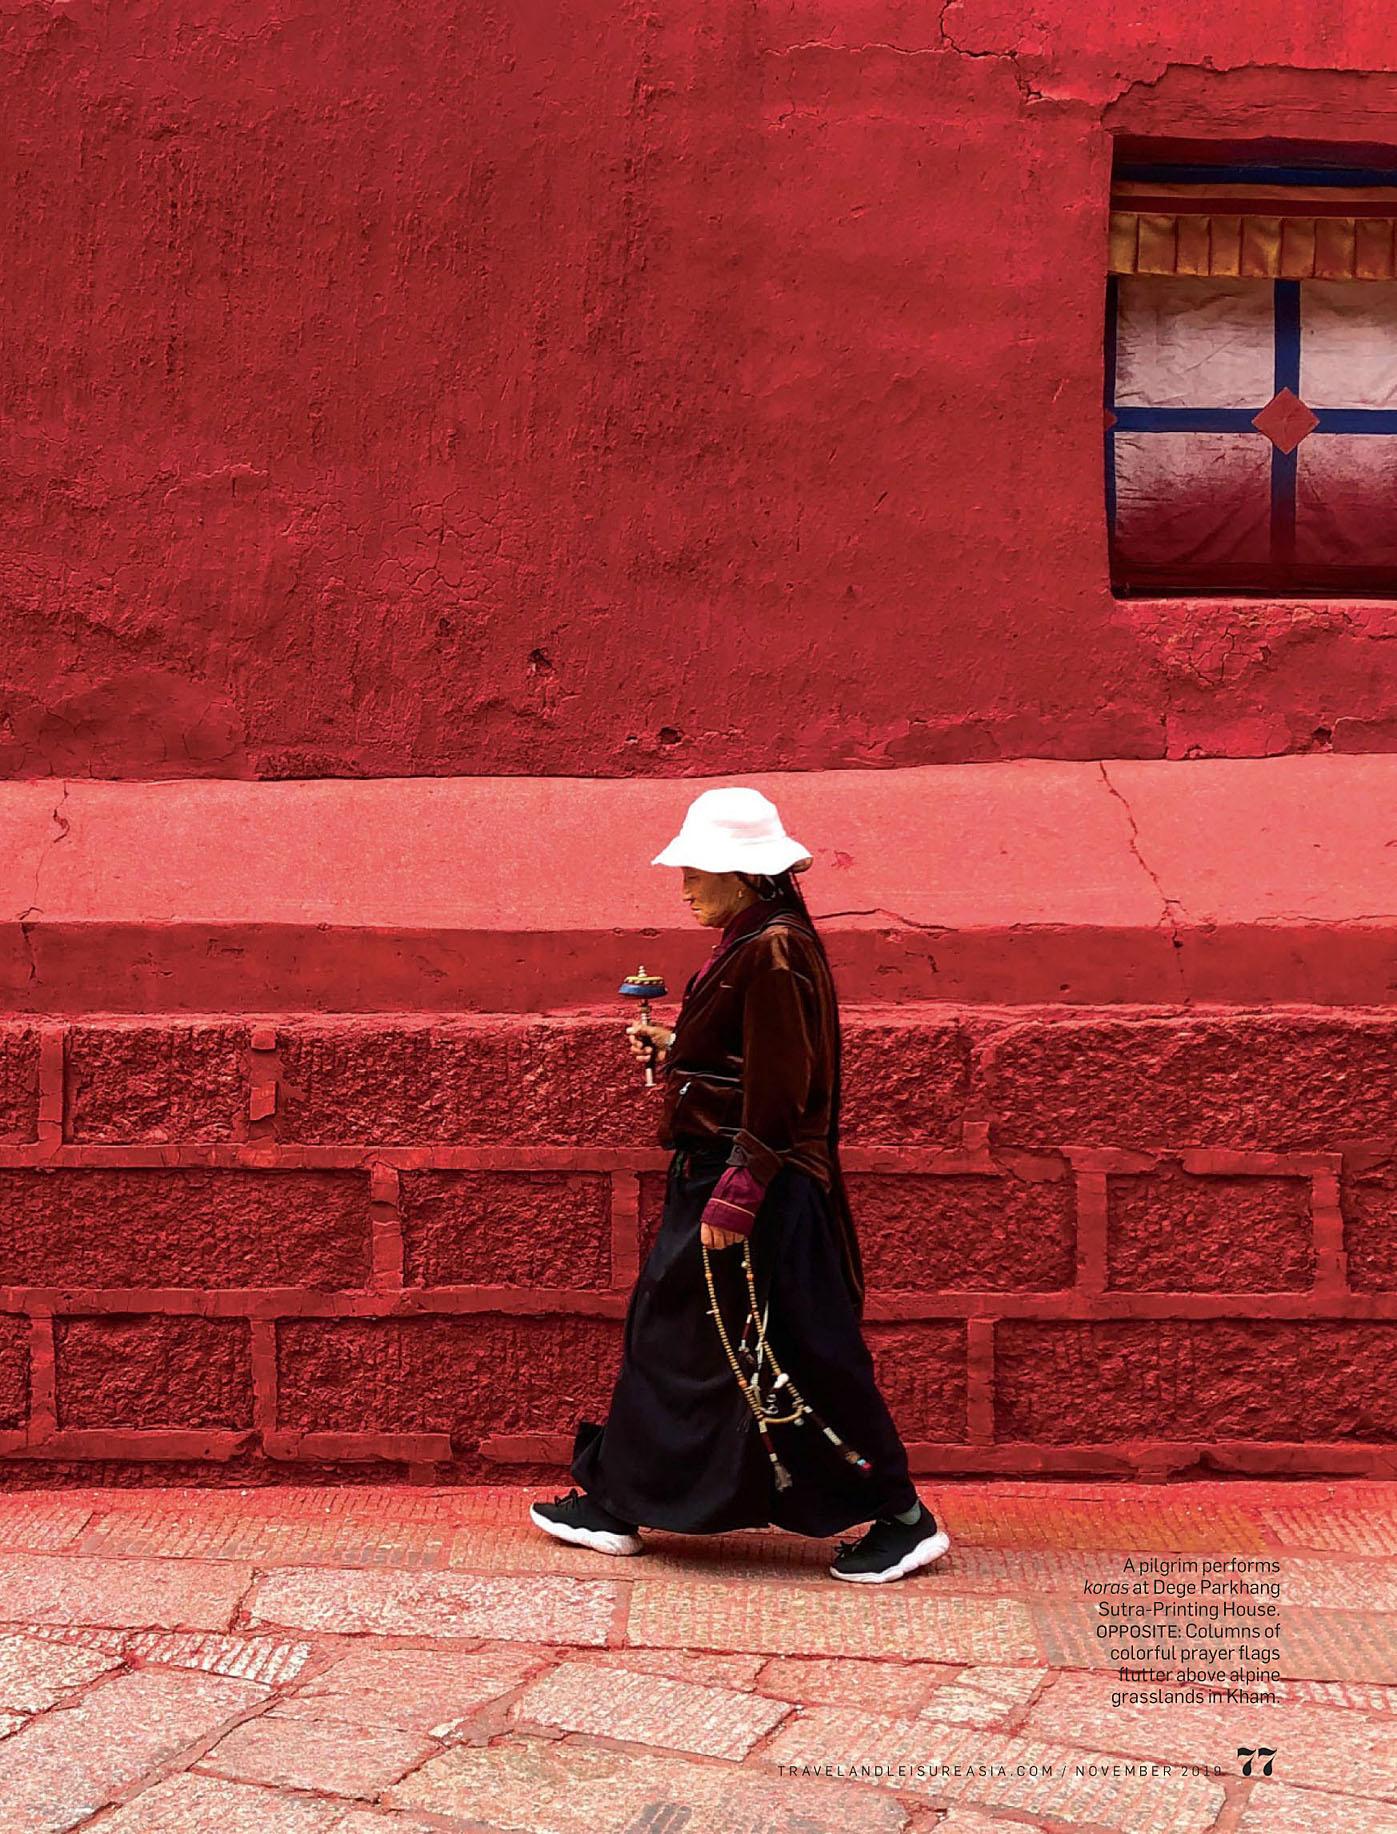 Travel & Leisure SE Asia 2019-11 Tibet 03.jpg